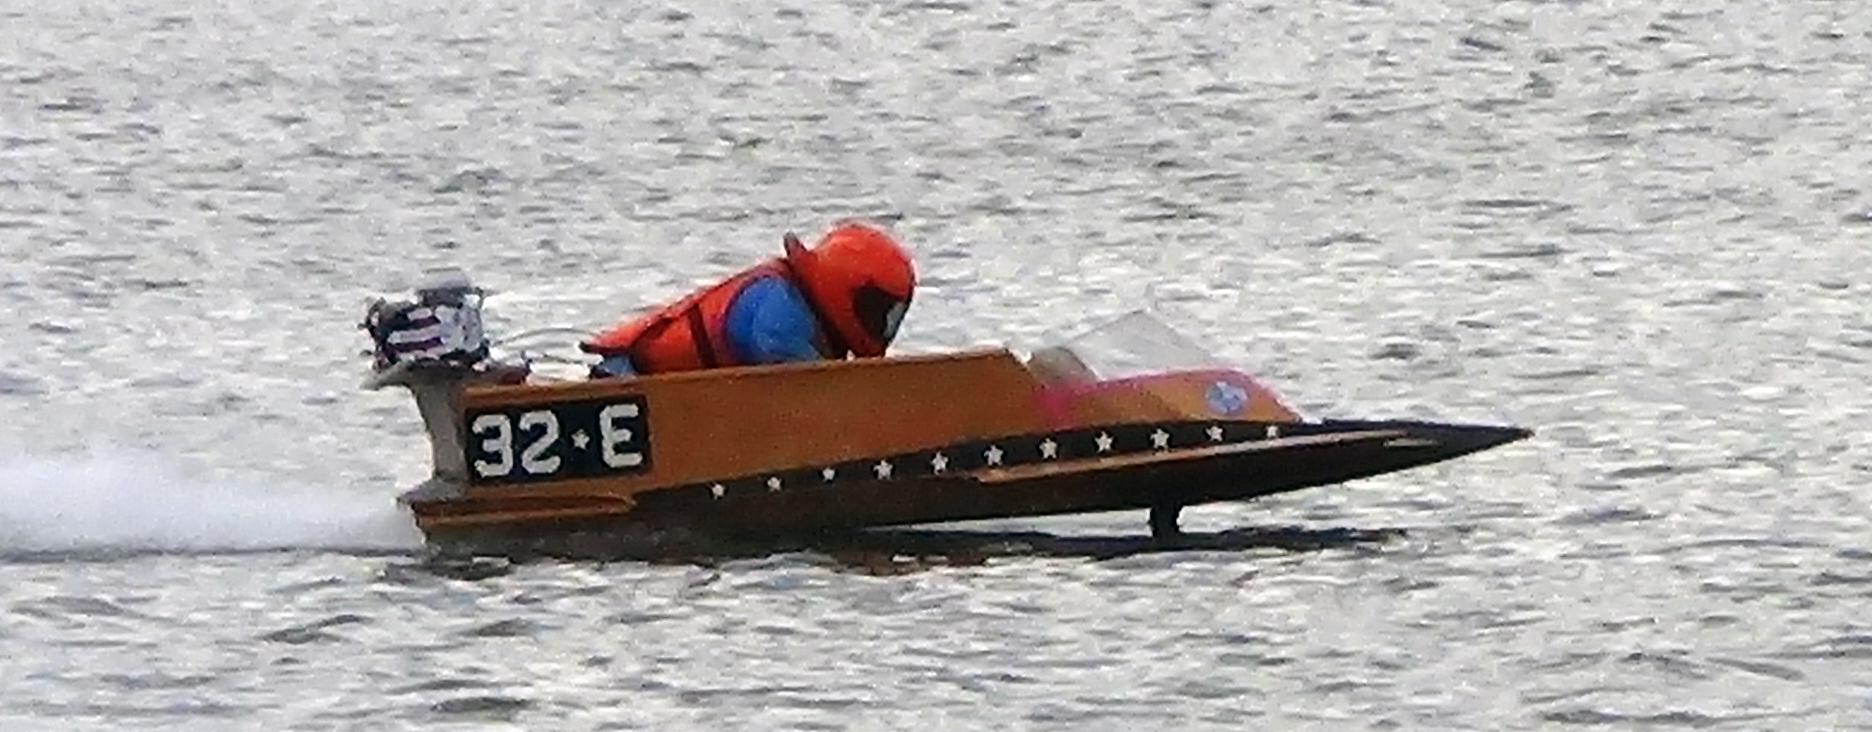 Vintage boat racing photo